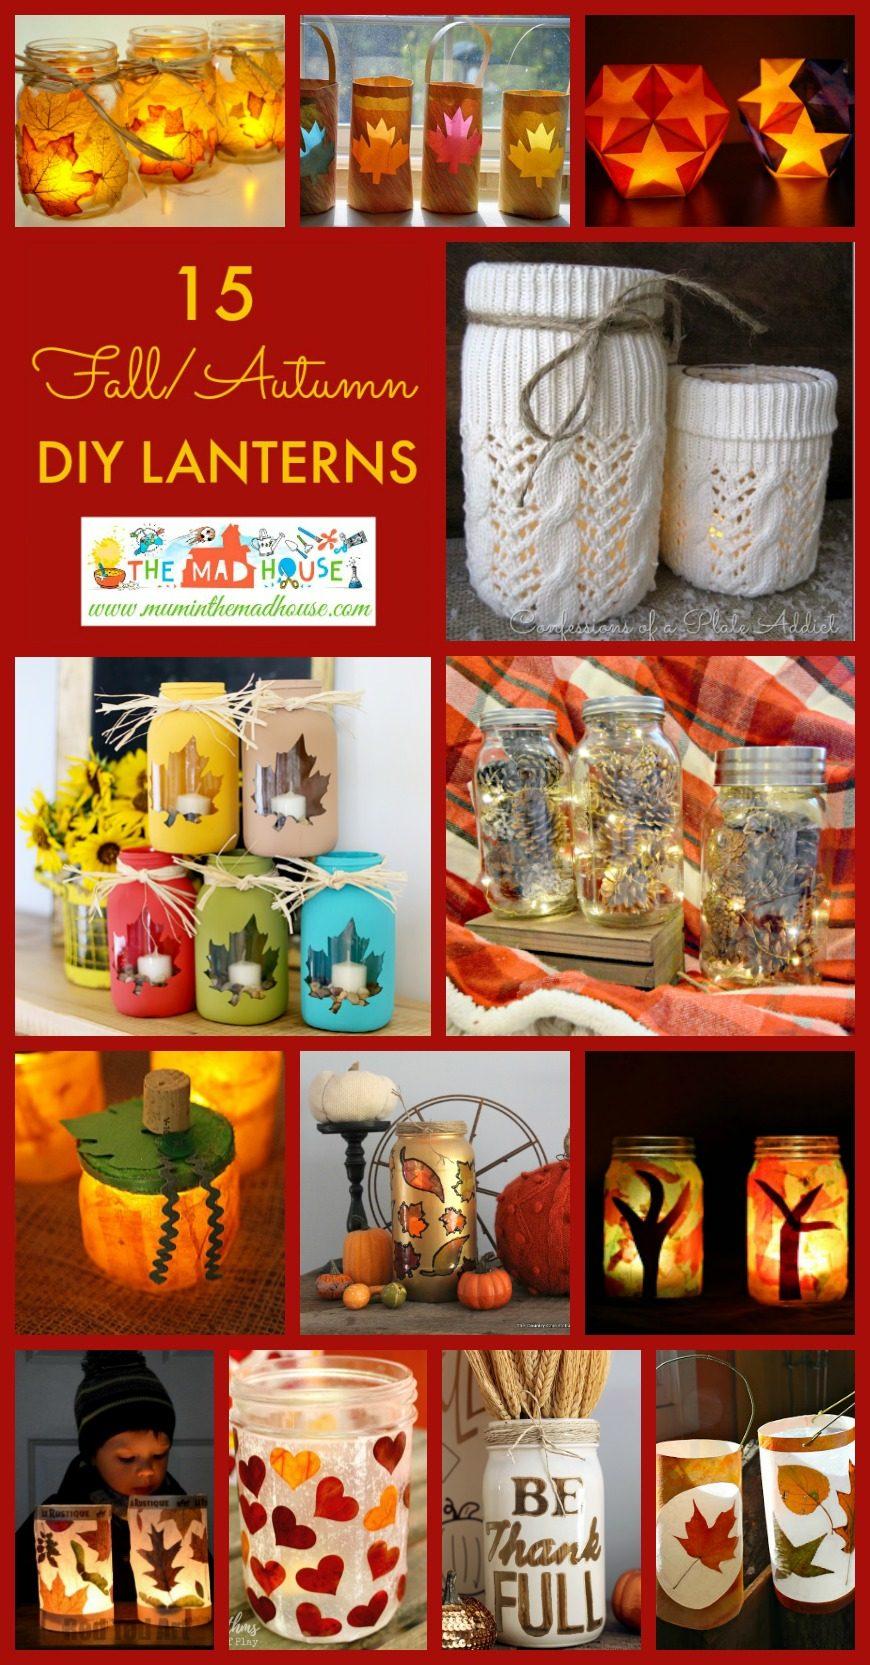 15 Fantastic Fall DIY Lanterns and Lights. Celebrate autumn with these beautiful seasonal DIY lanterns, luminaries and lights.